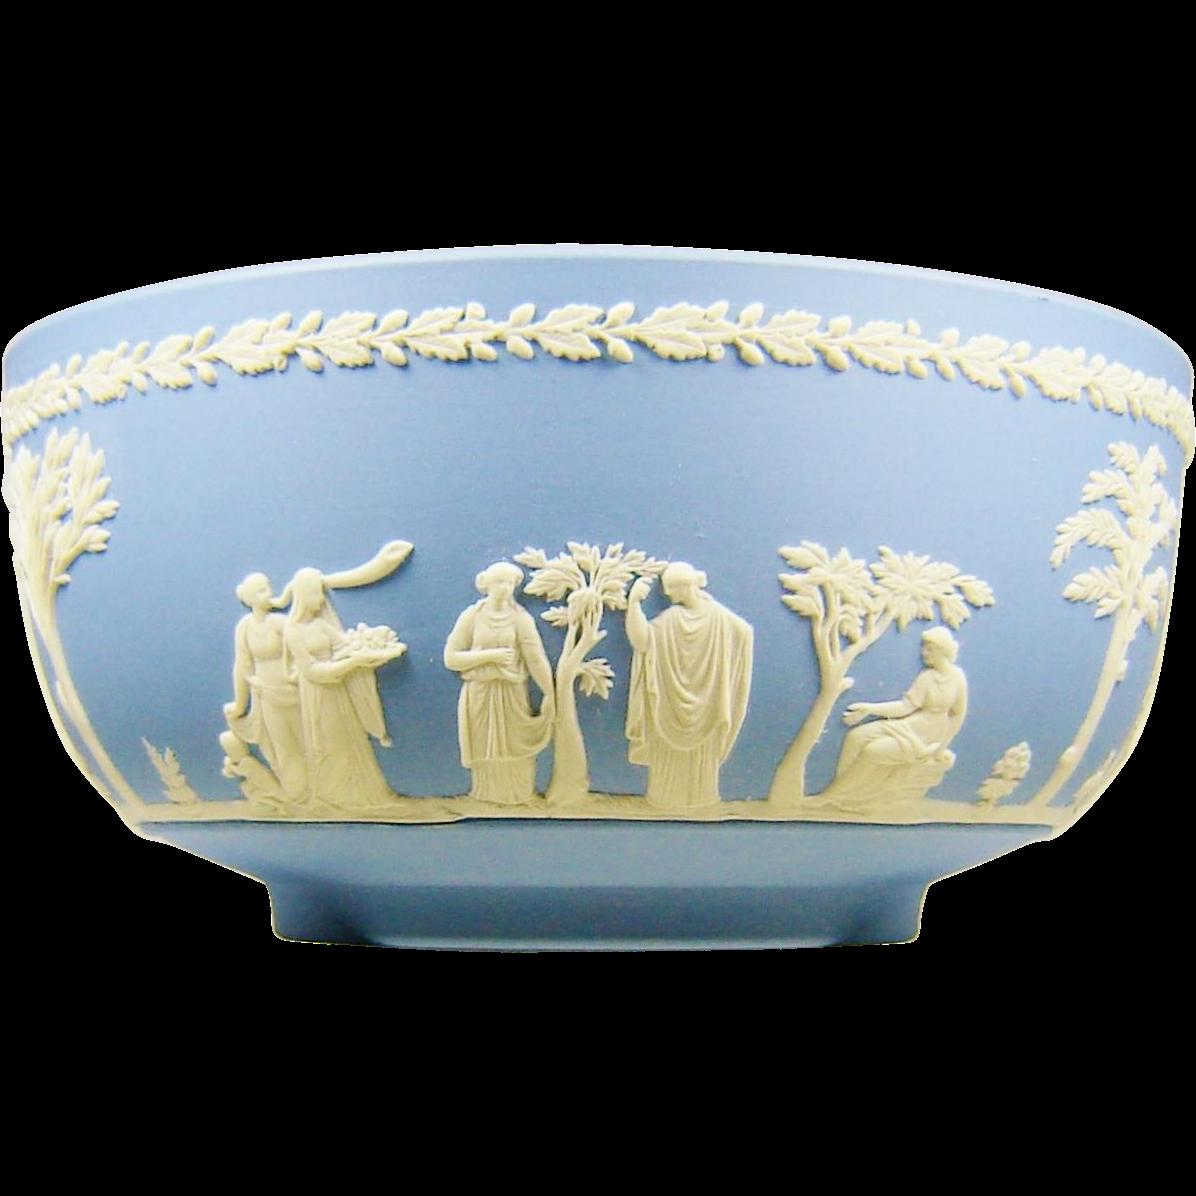 Wedgwood Blue Jasperware Sacrifice Bowl